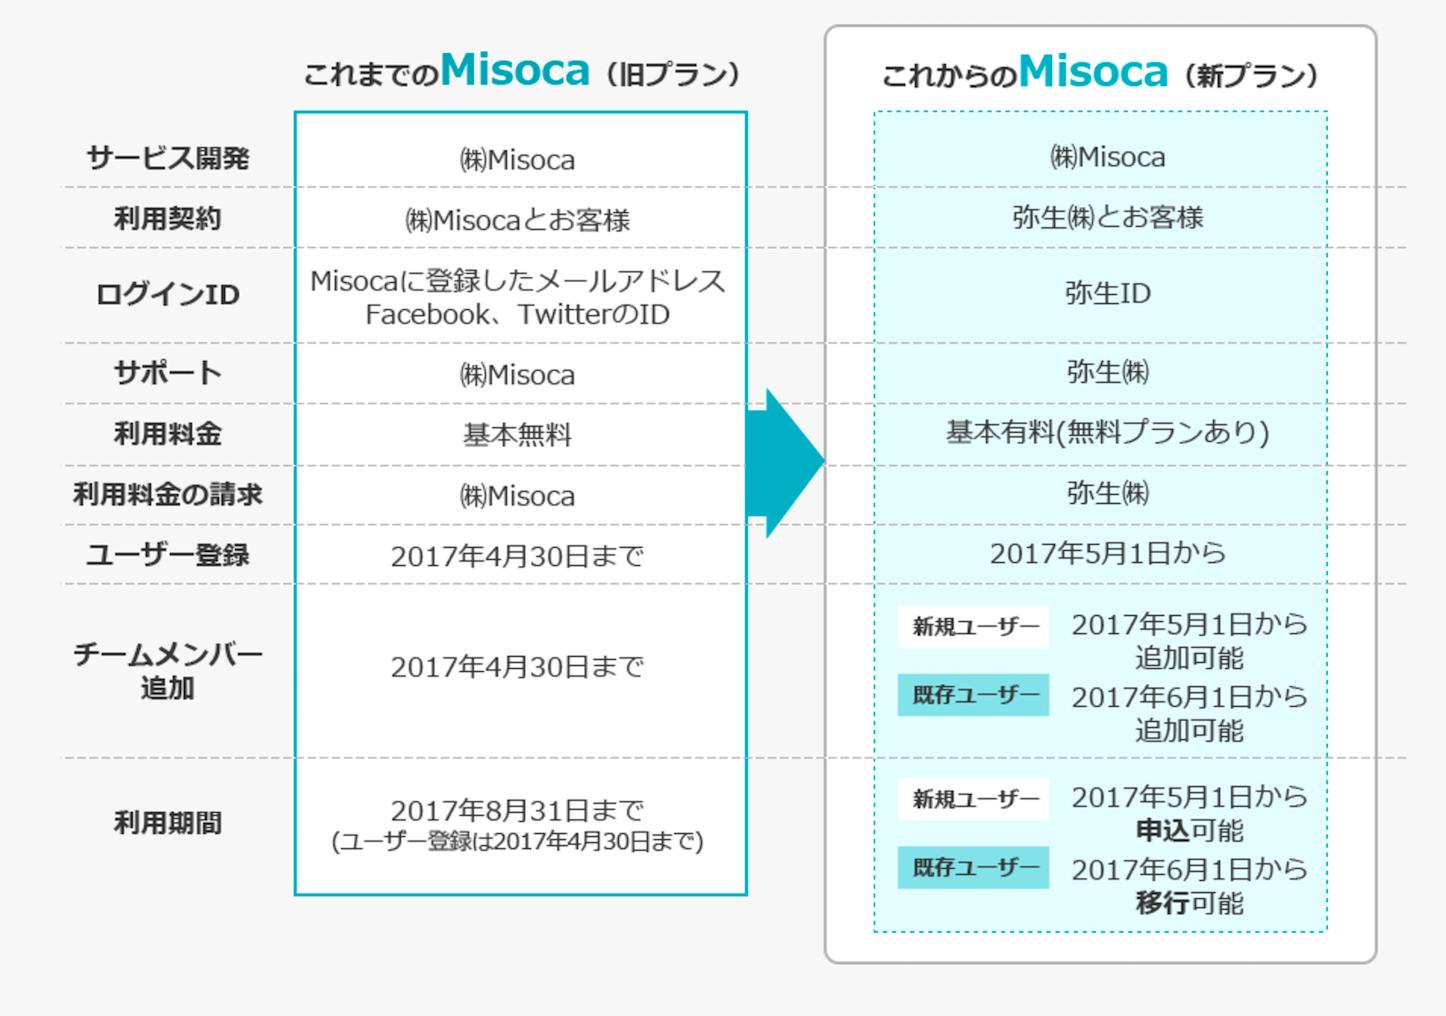 Misocaから弥生へ